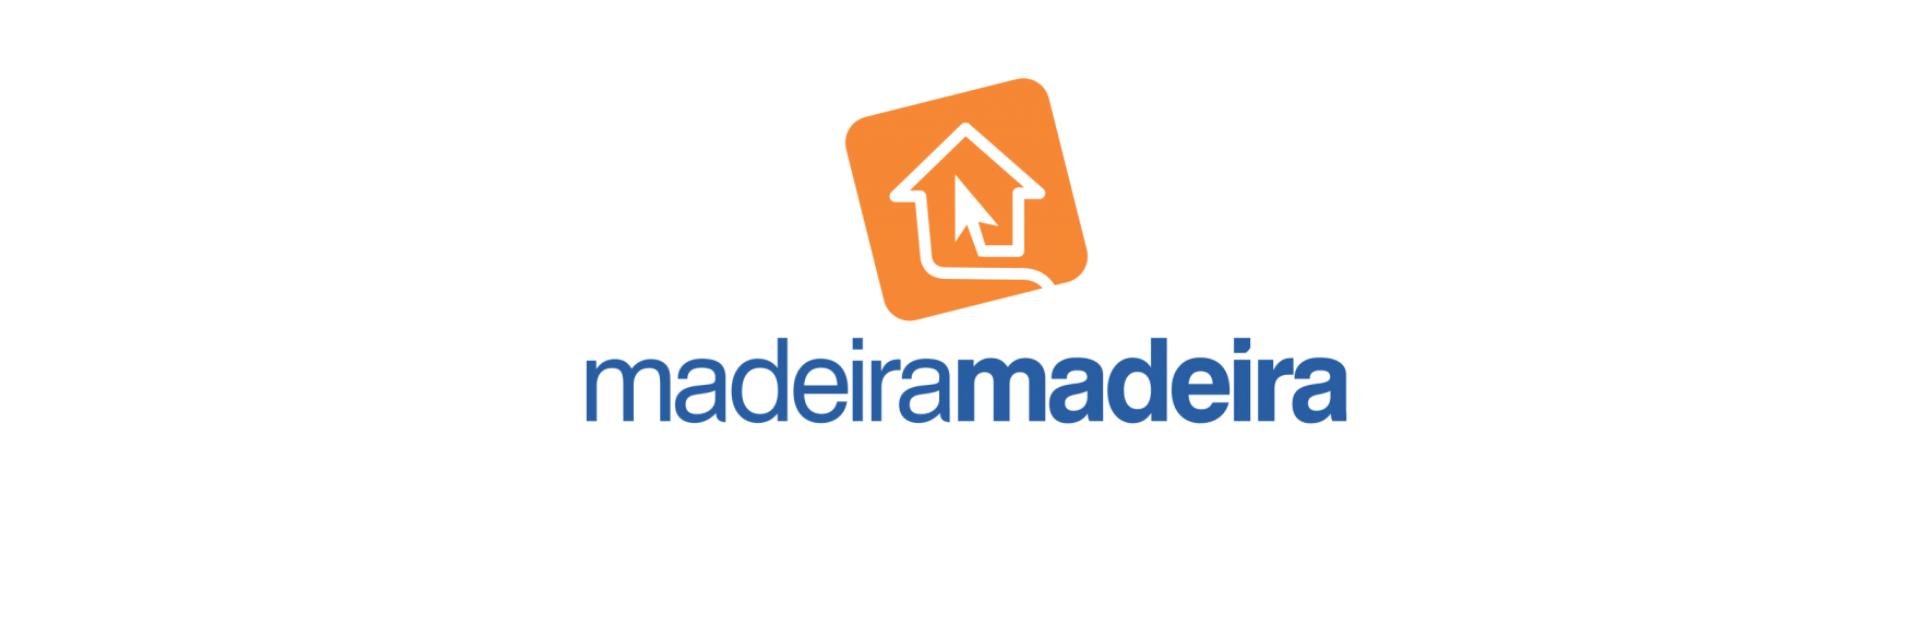 MadeiraMadeira recebe novo aporte, vira unicórnio (como previsto) e dá deixa de IPO em breve